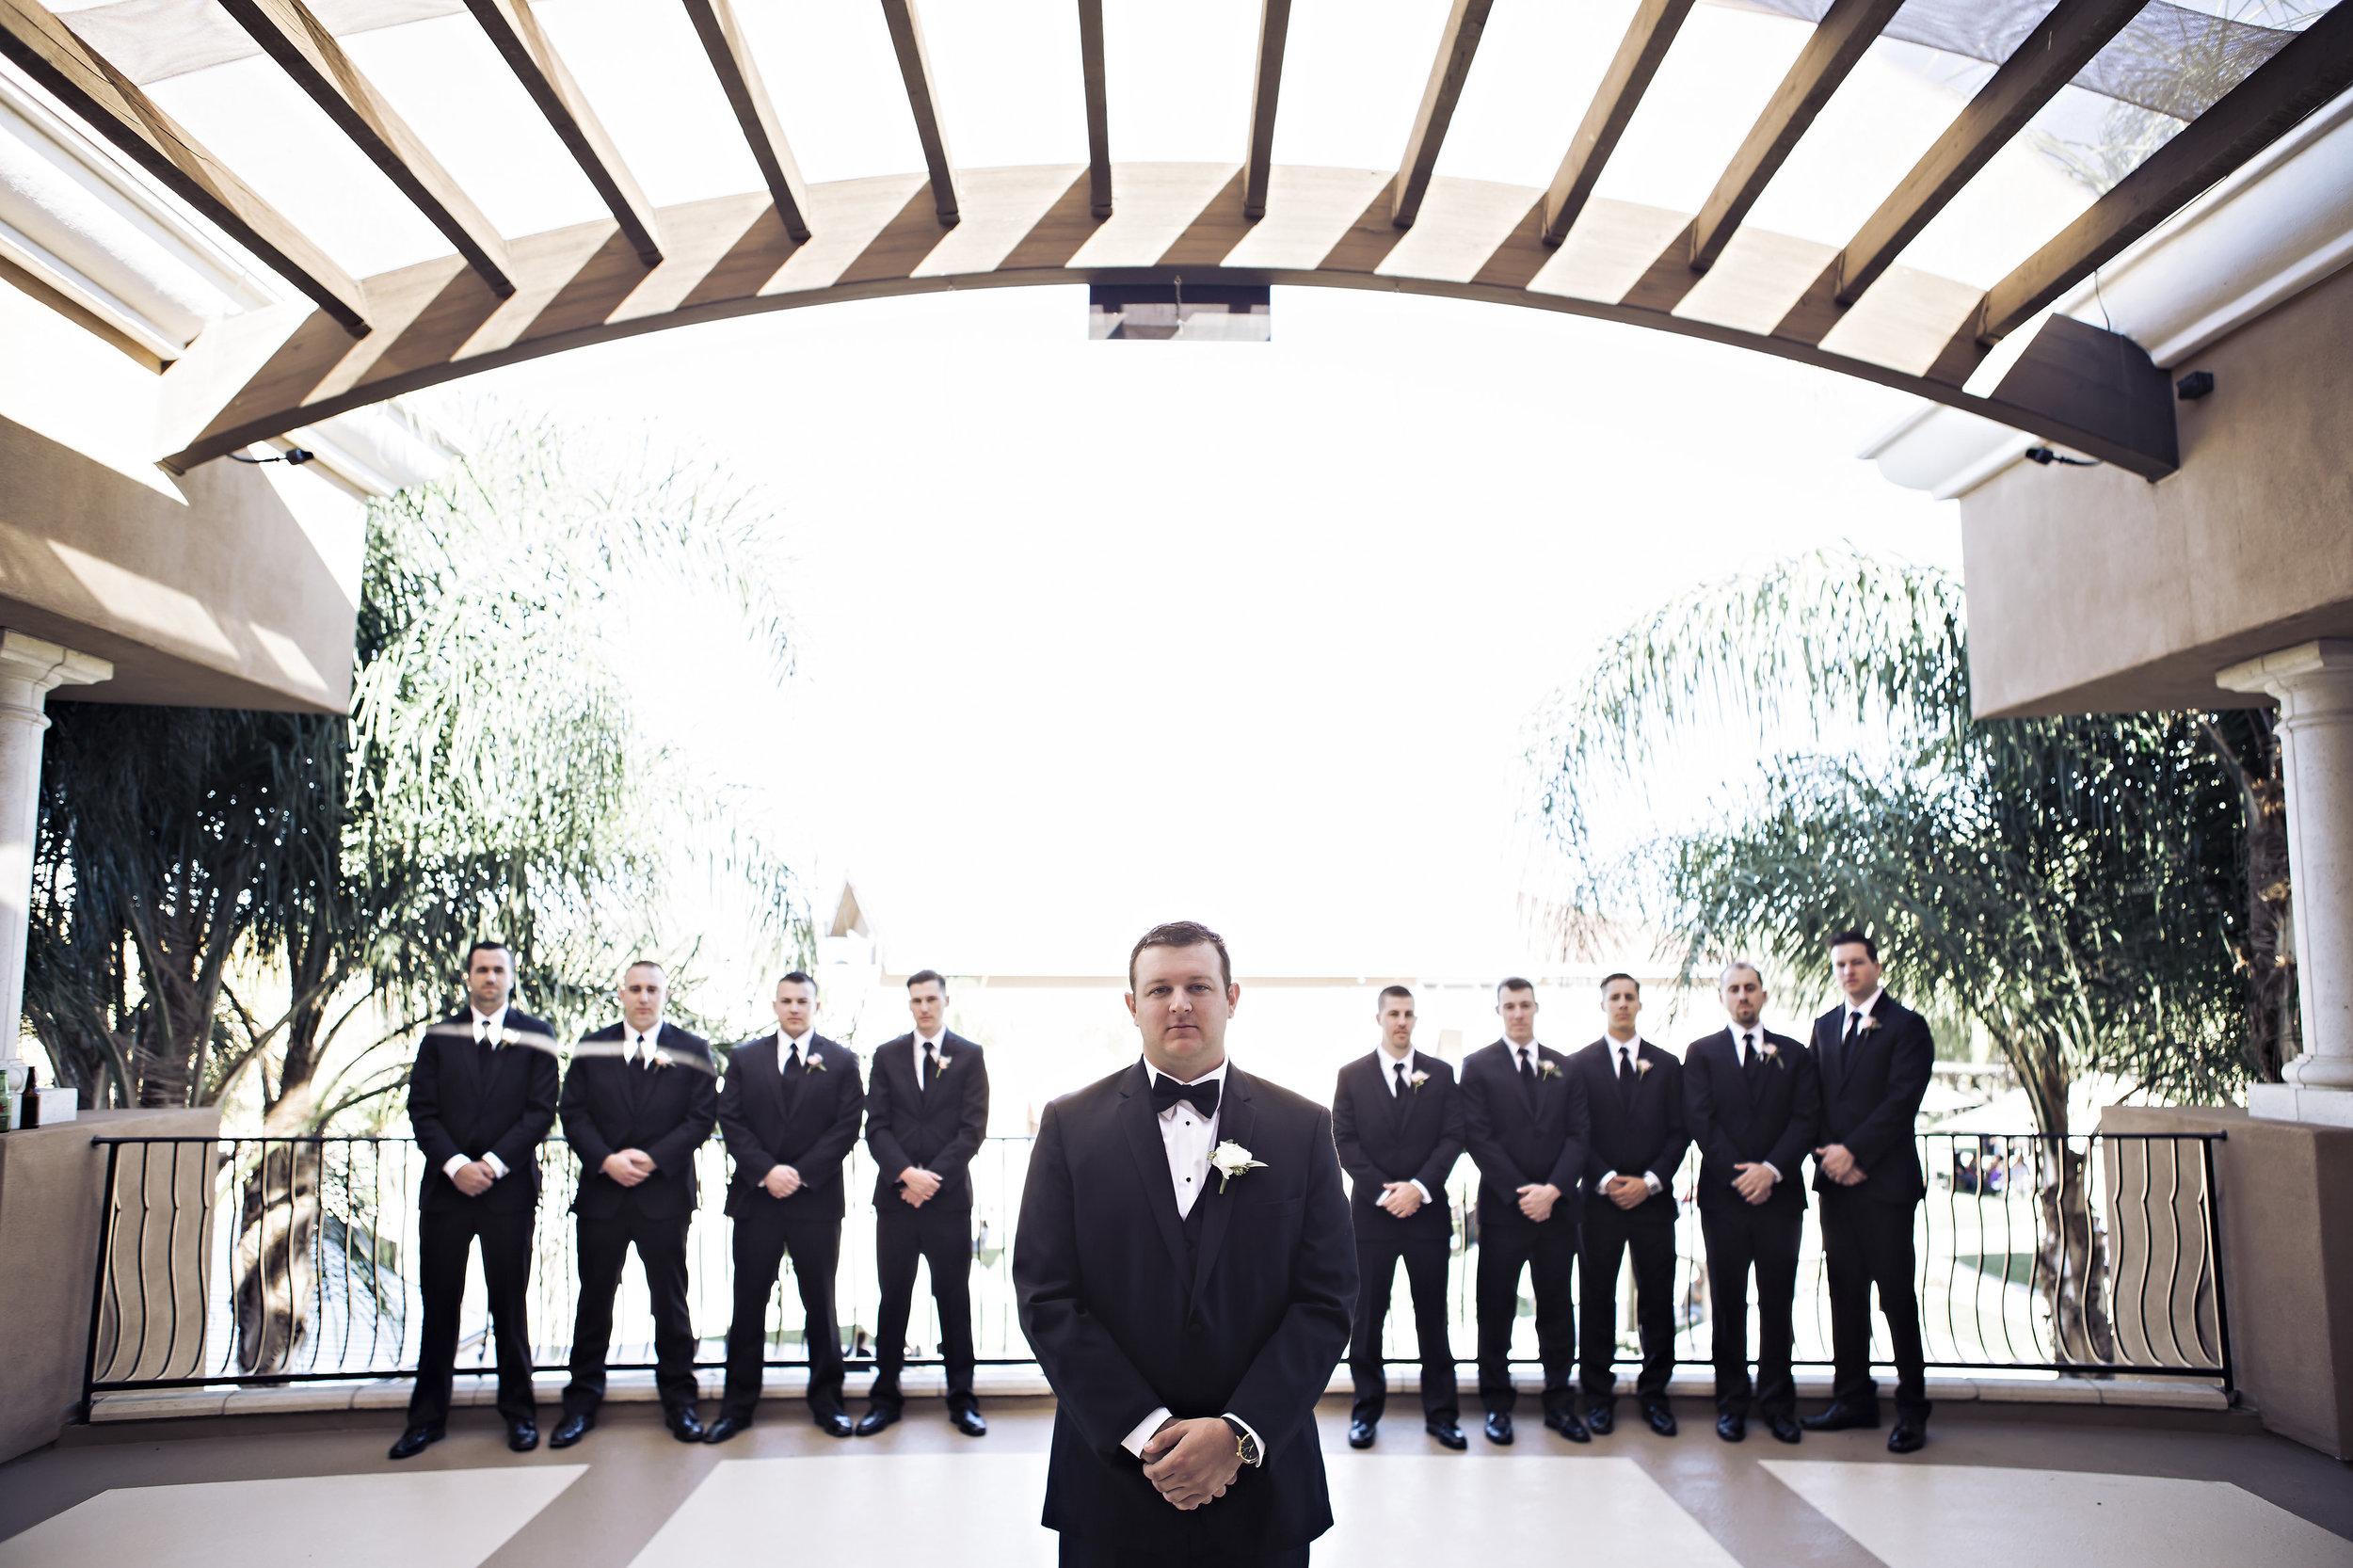 Wilson Creek Winery | Temecula Private Estate Wedding | Michelle Garibay Events